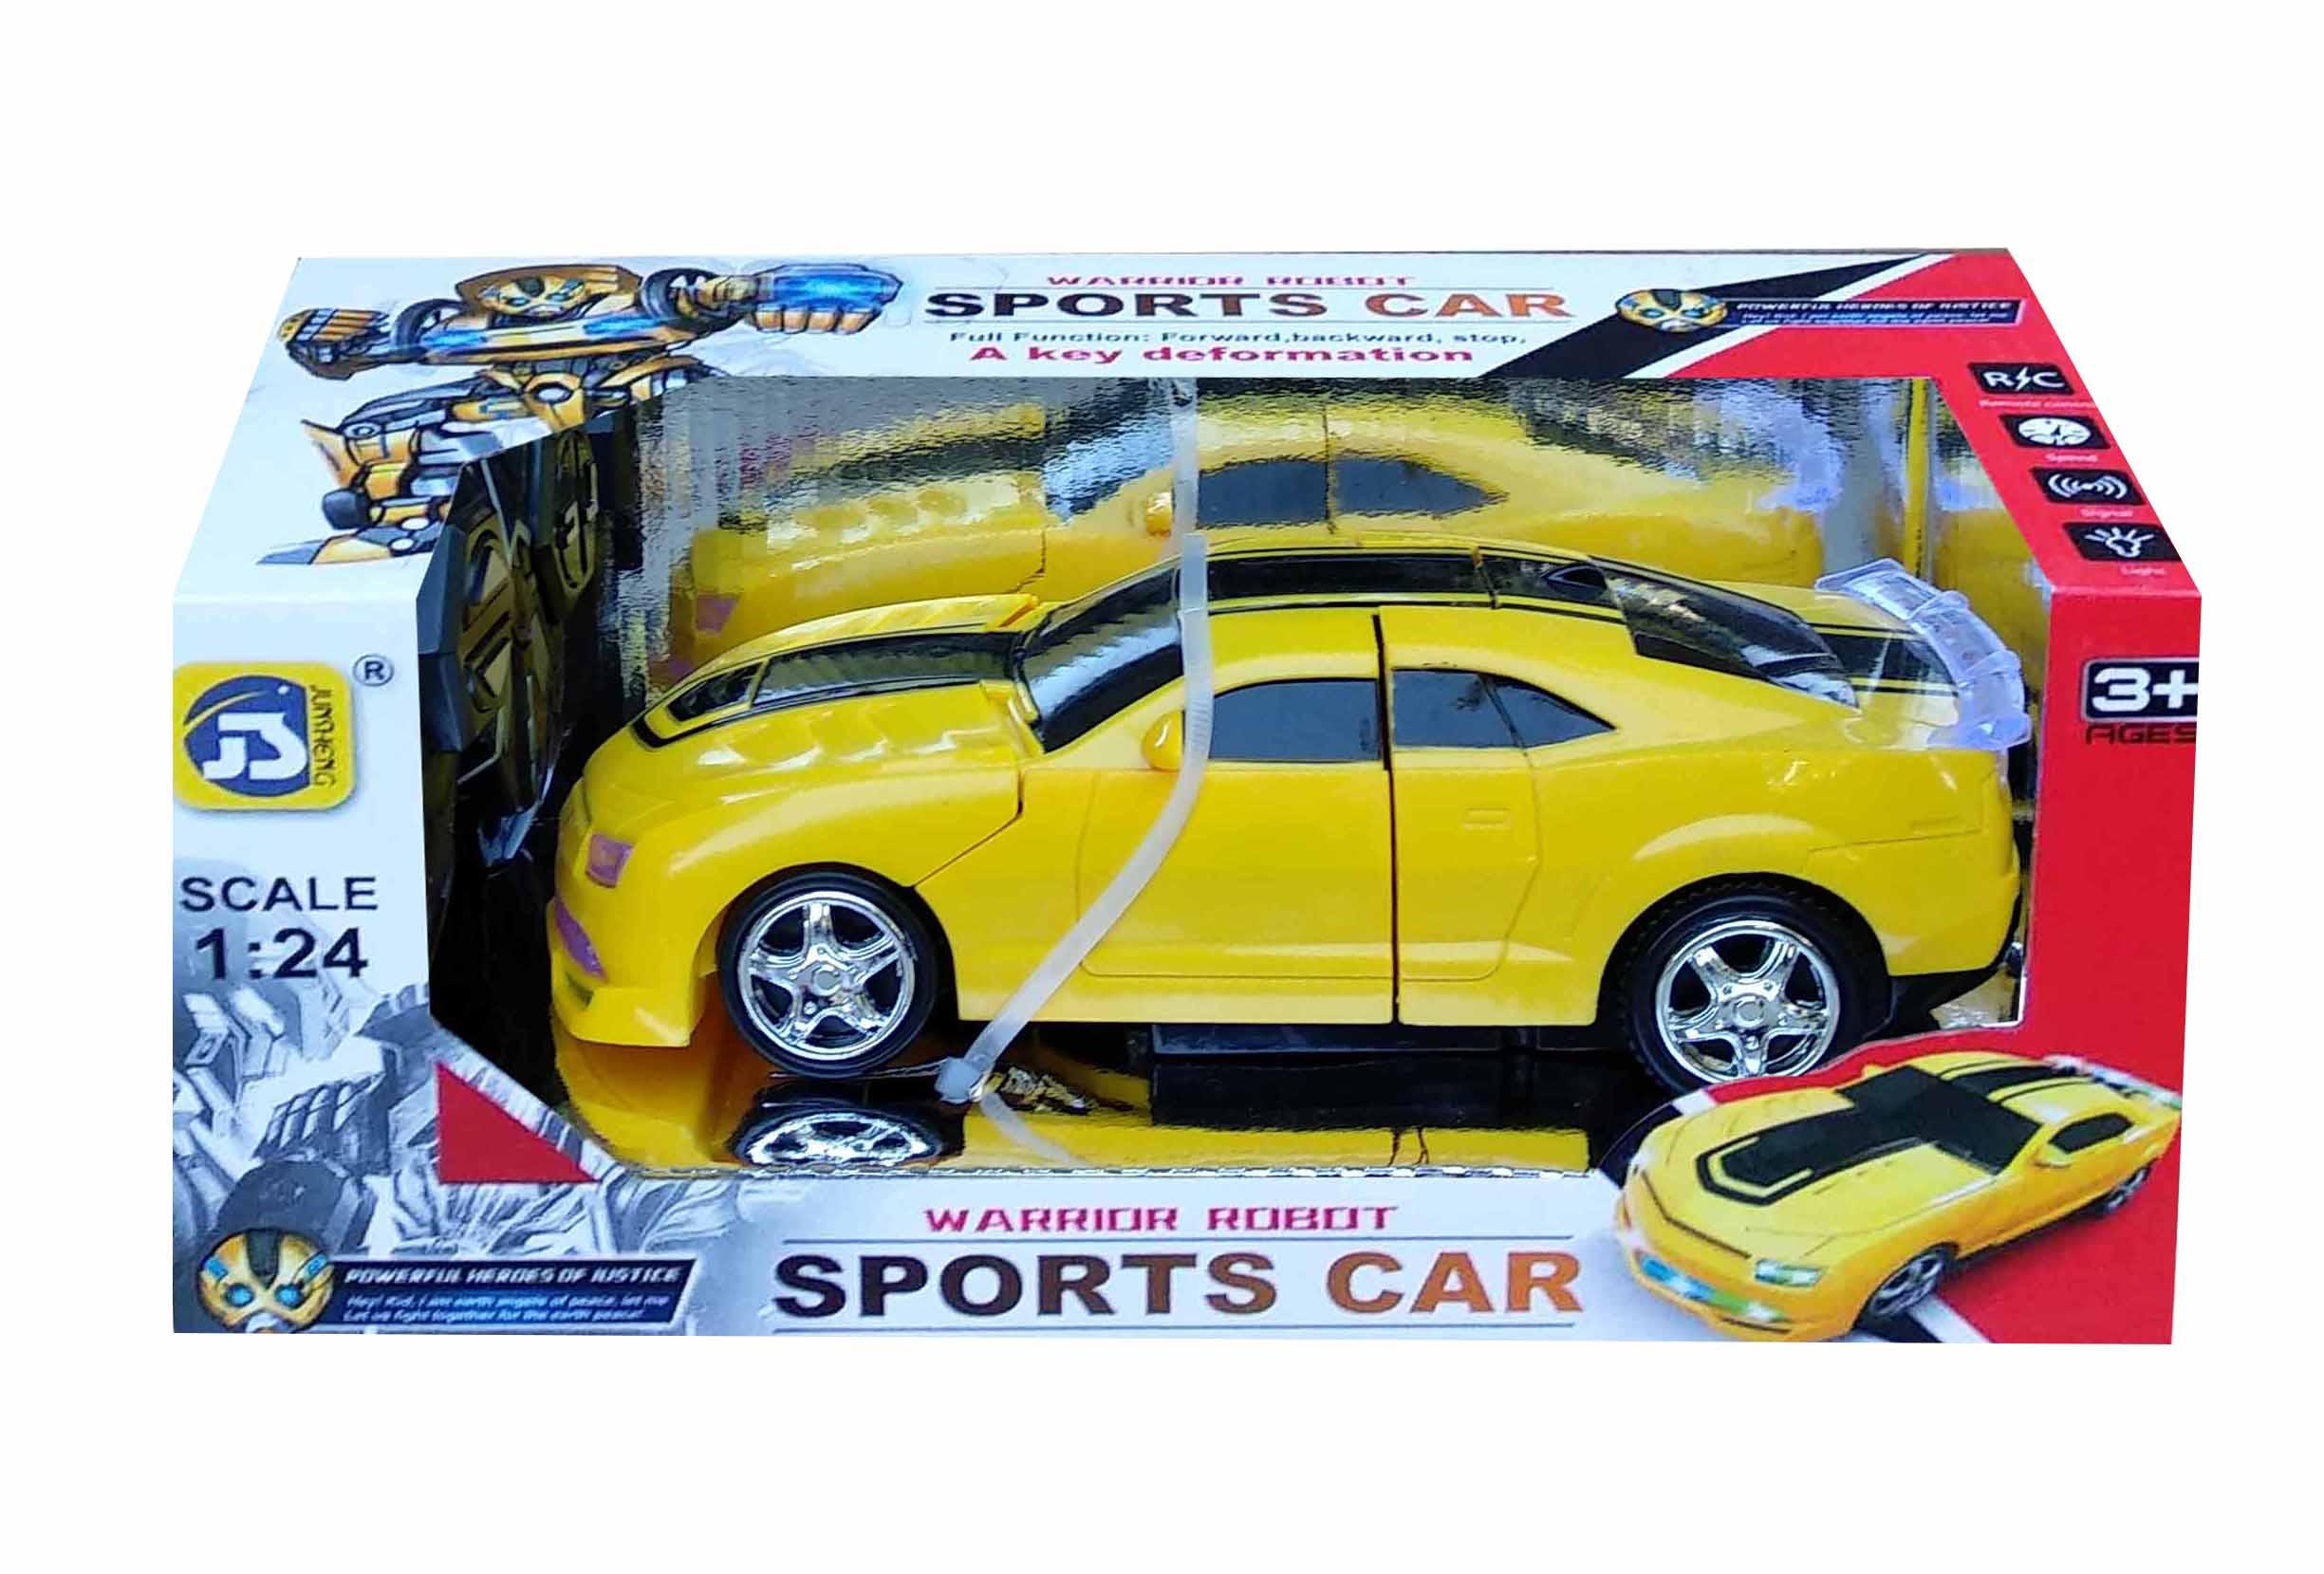 toko mainan online RC WARRIOR ROBOT SPORT CAR - JS001A